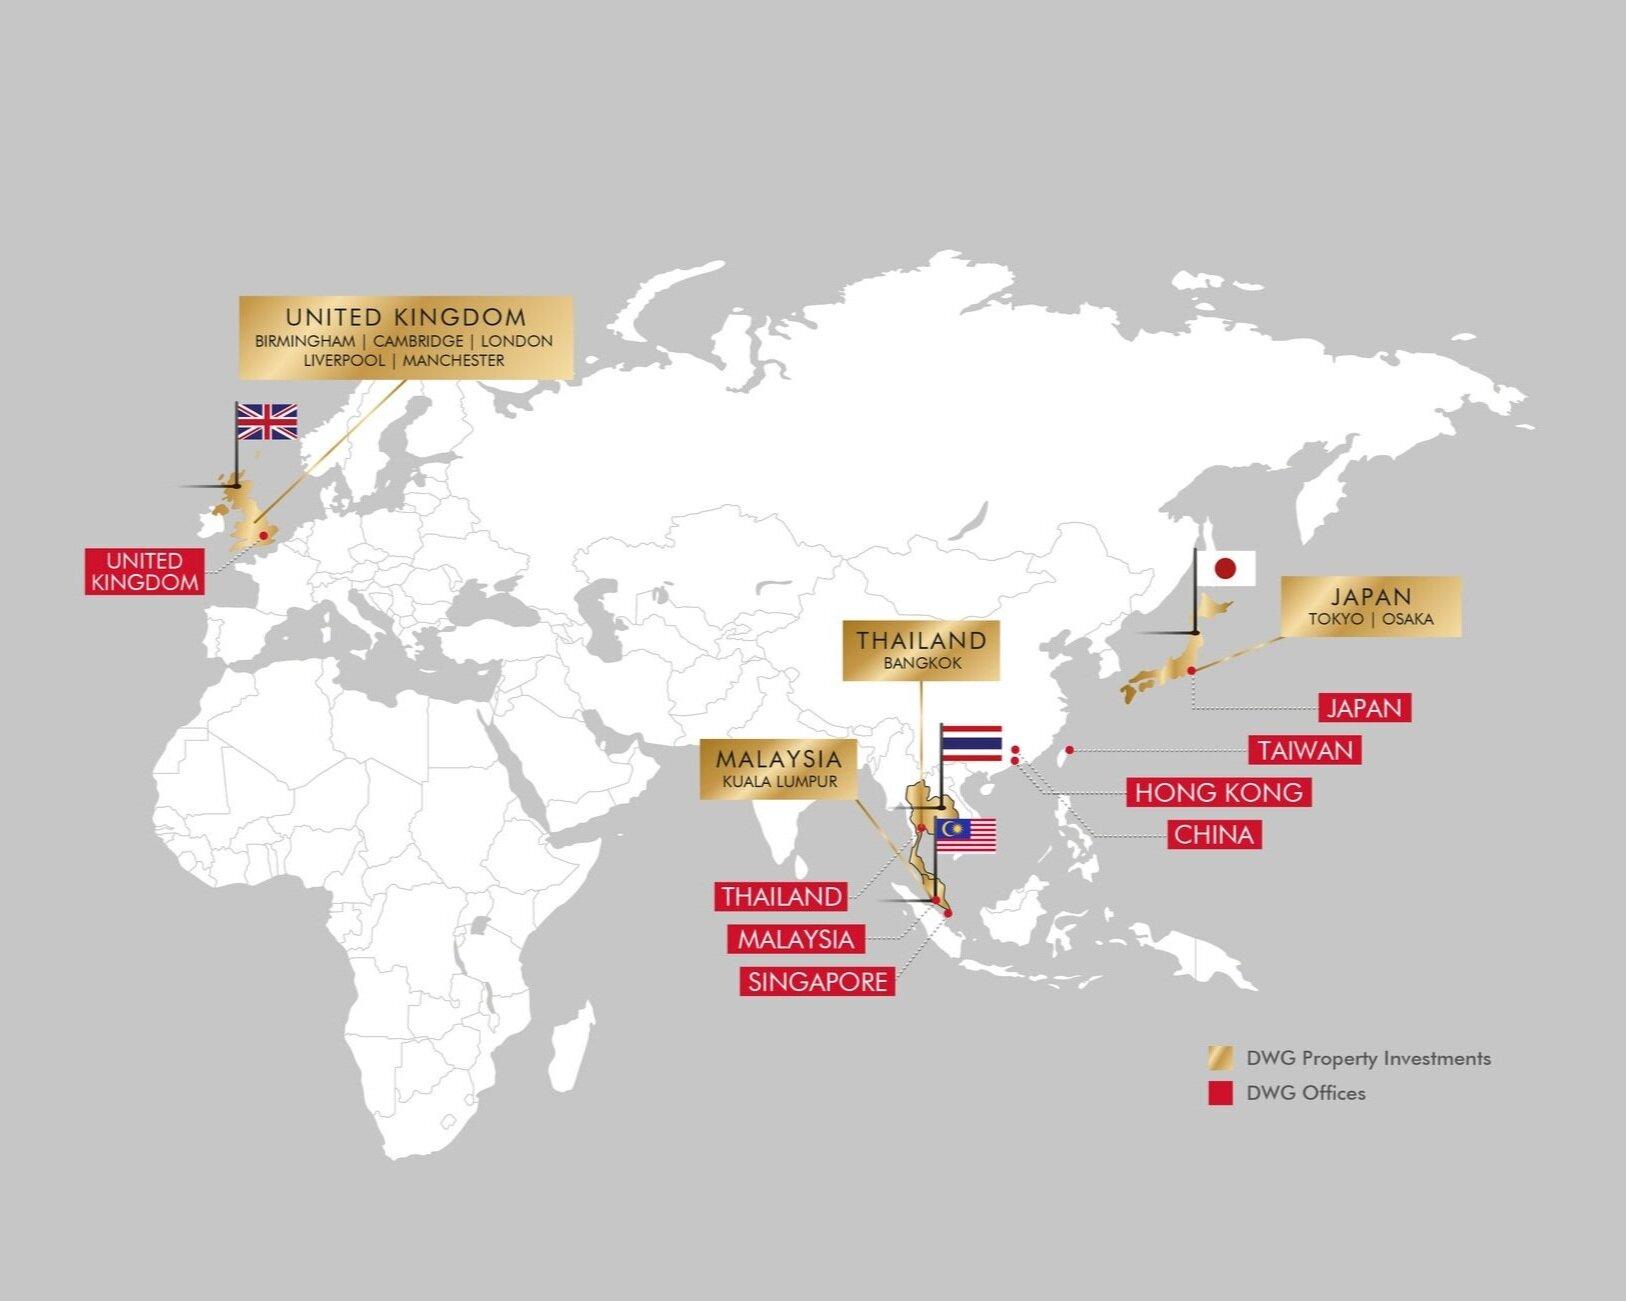 DWG+Global+Investment_GREY-03.jpg